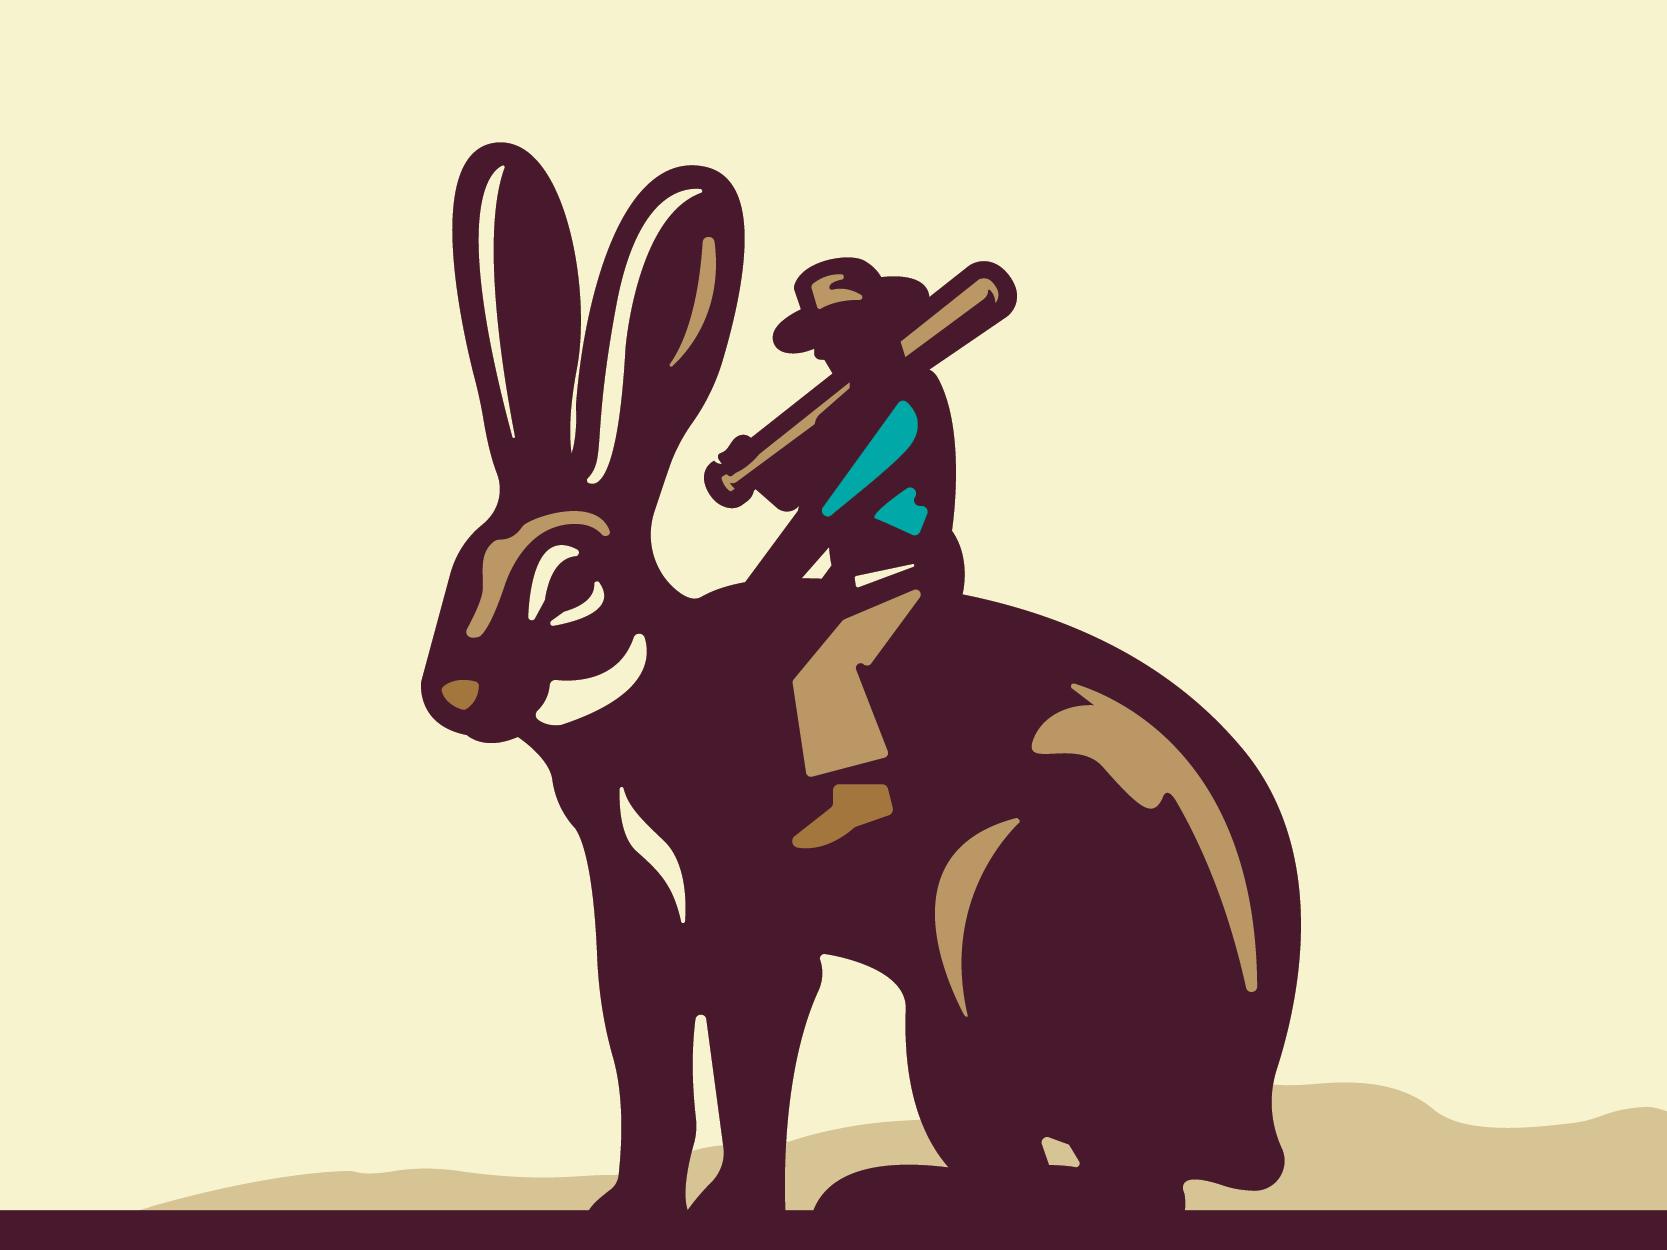 Dribbblejackrabbit 01